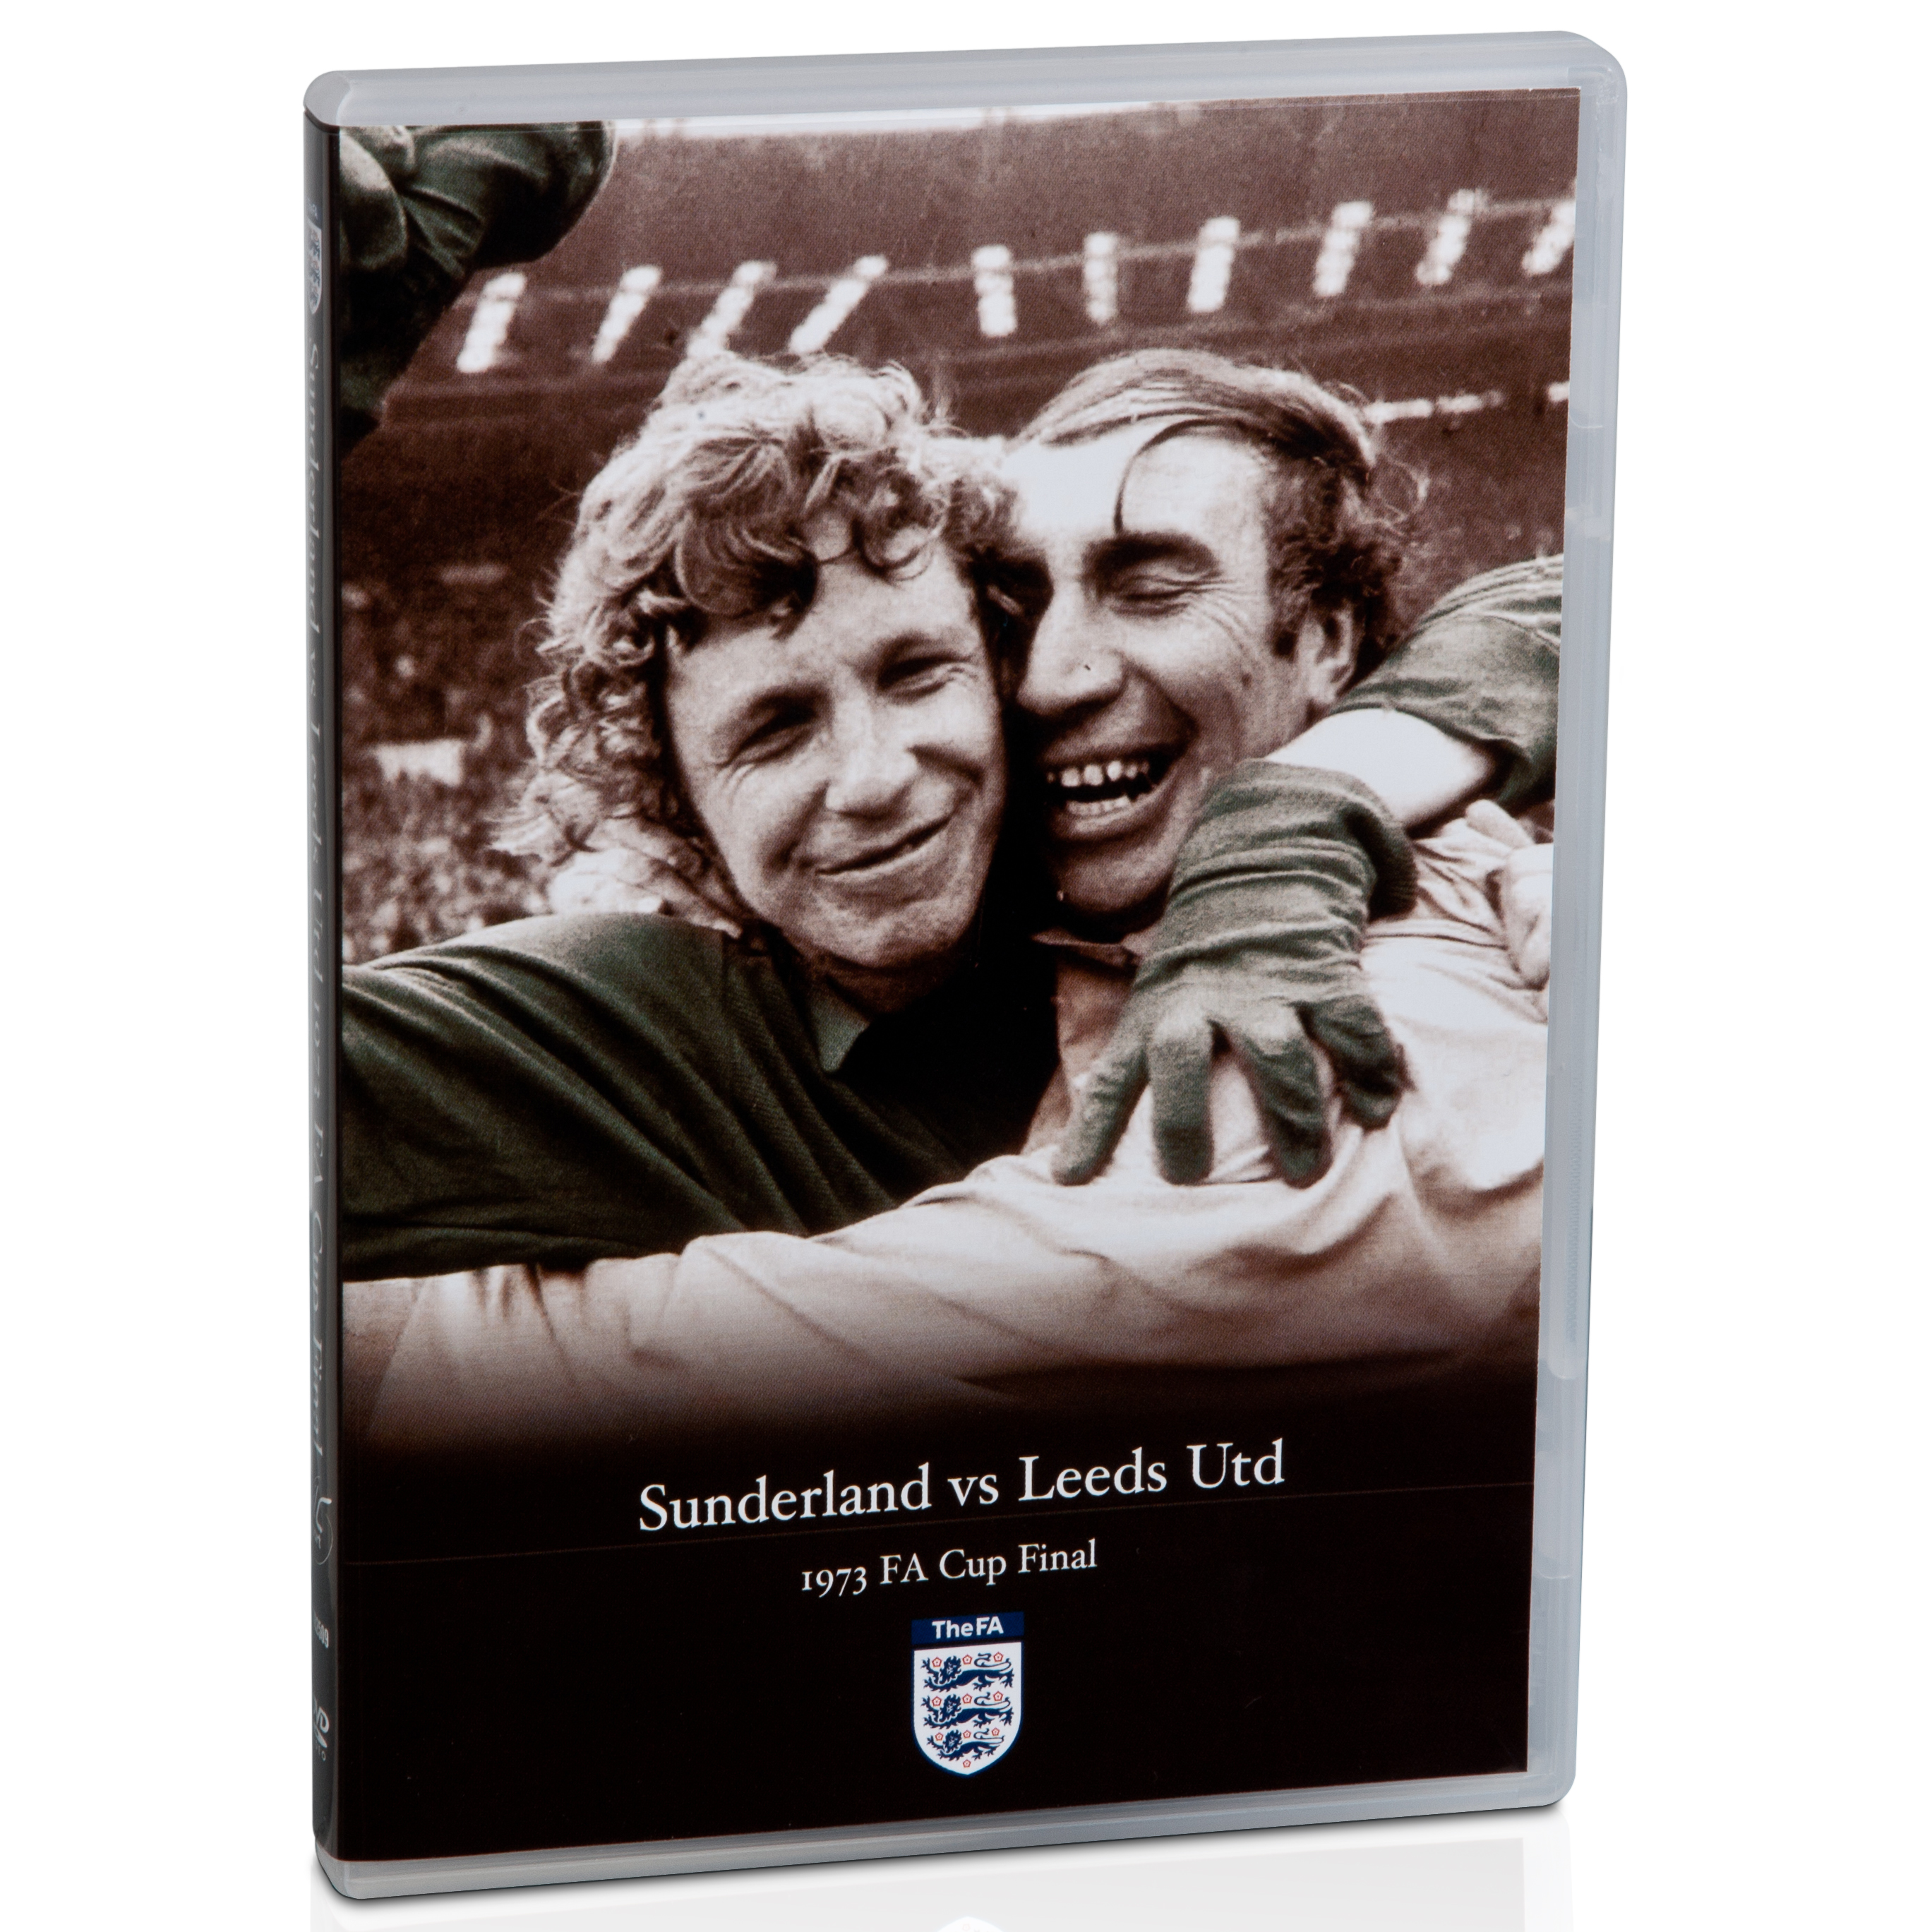 Sunderland Vs 1973 FA Cup Final DVD